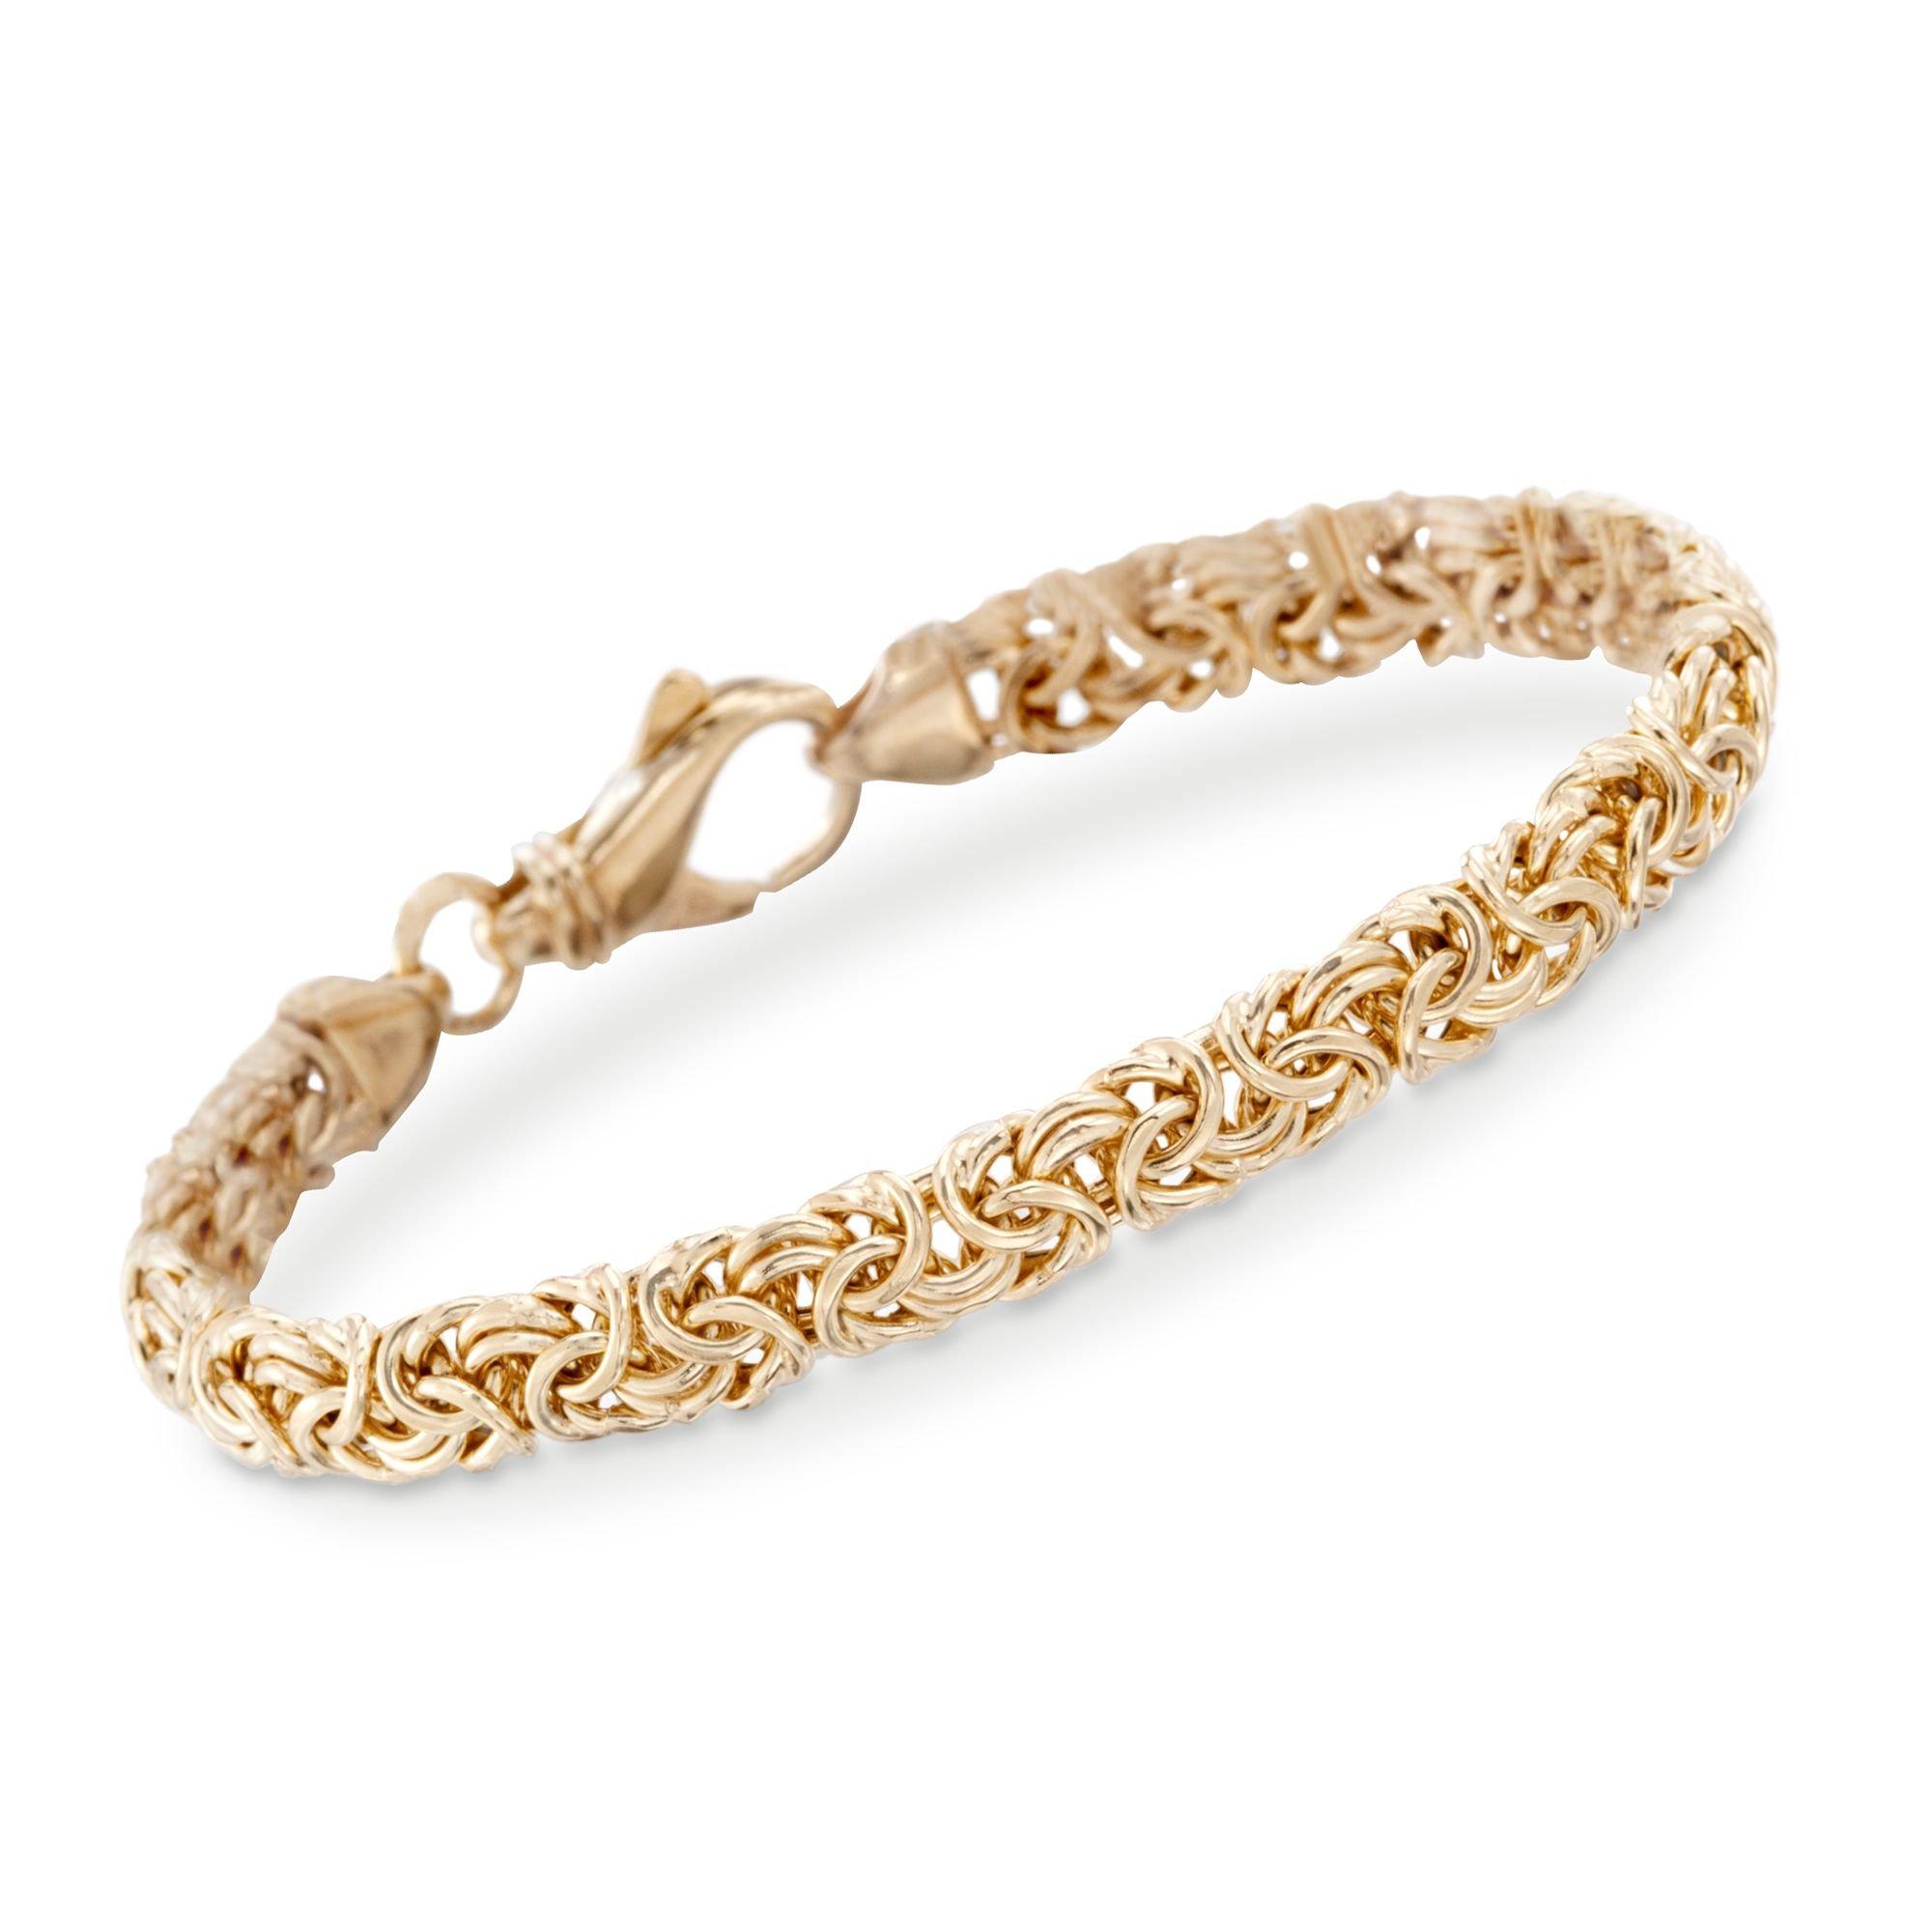 Ross-Simons 18kt Gold Over Sterling Silver Small Byzantine Bracelet by Ross-Simons